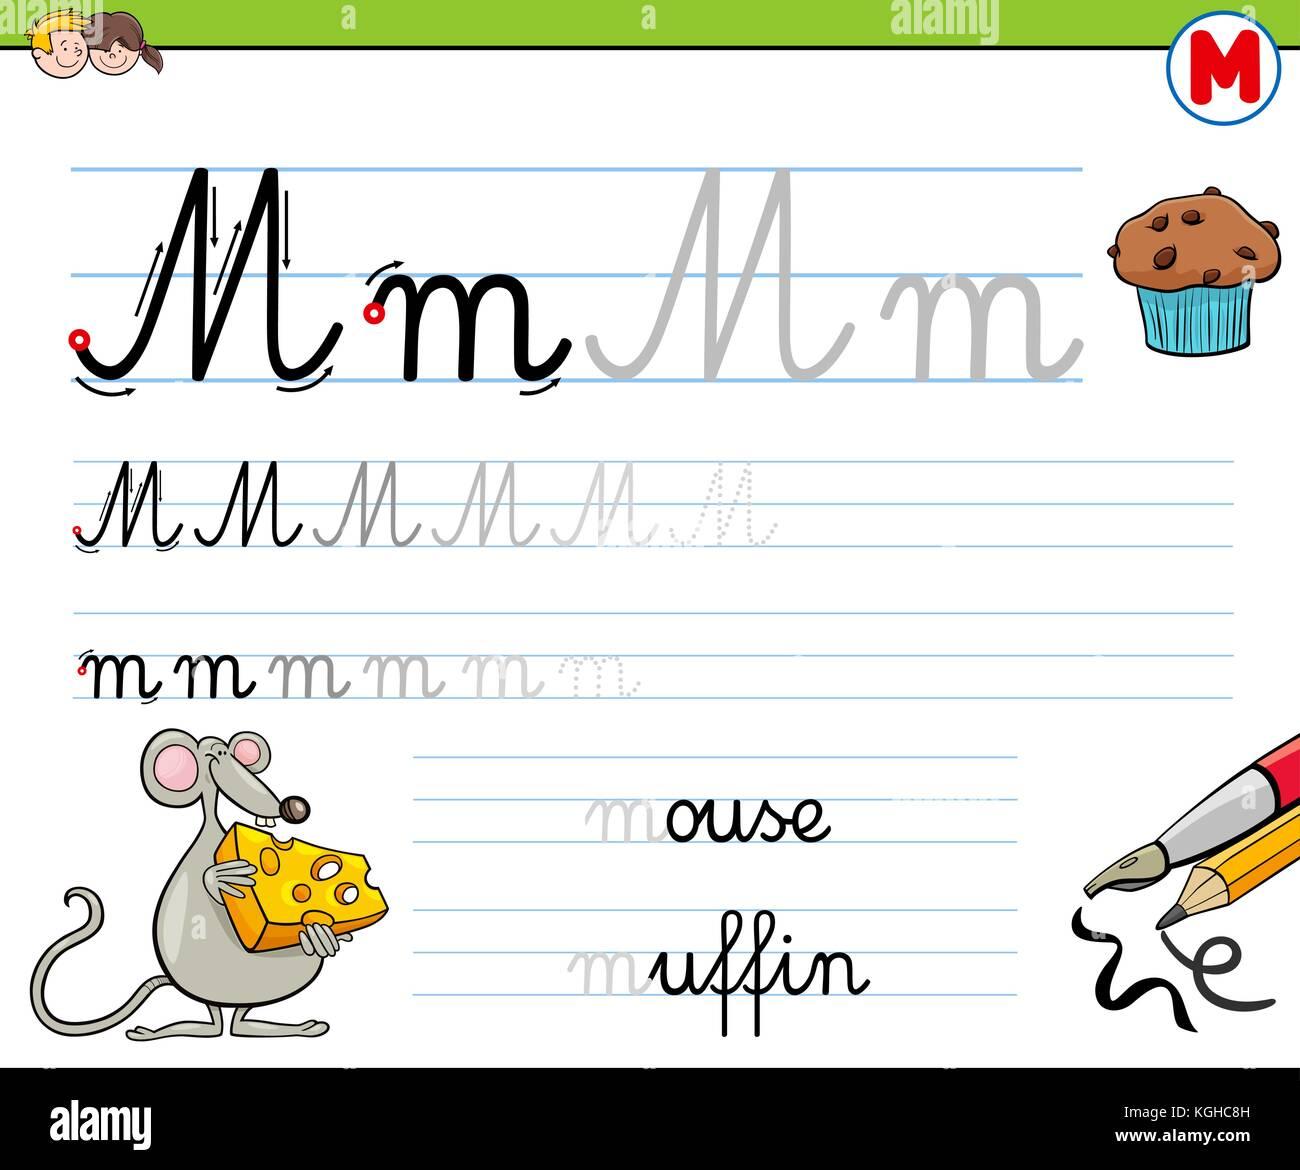 Cartoon Illustration Of Writing Skills Practice With